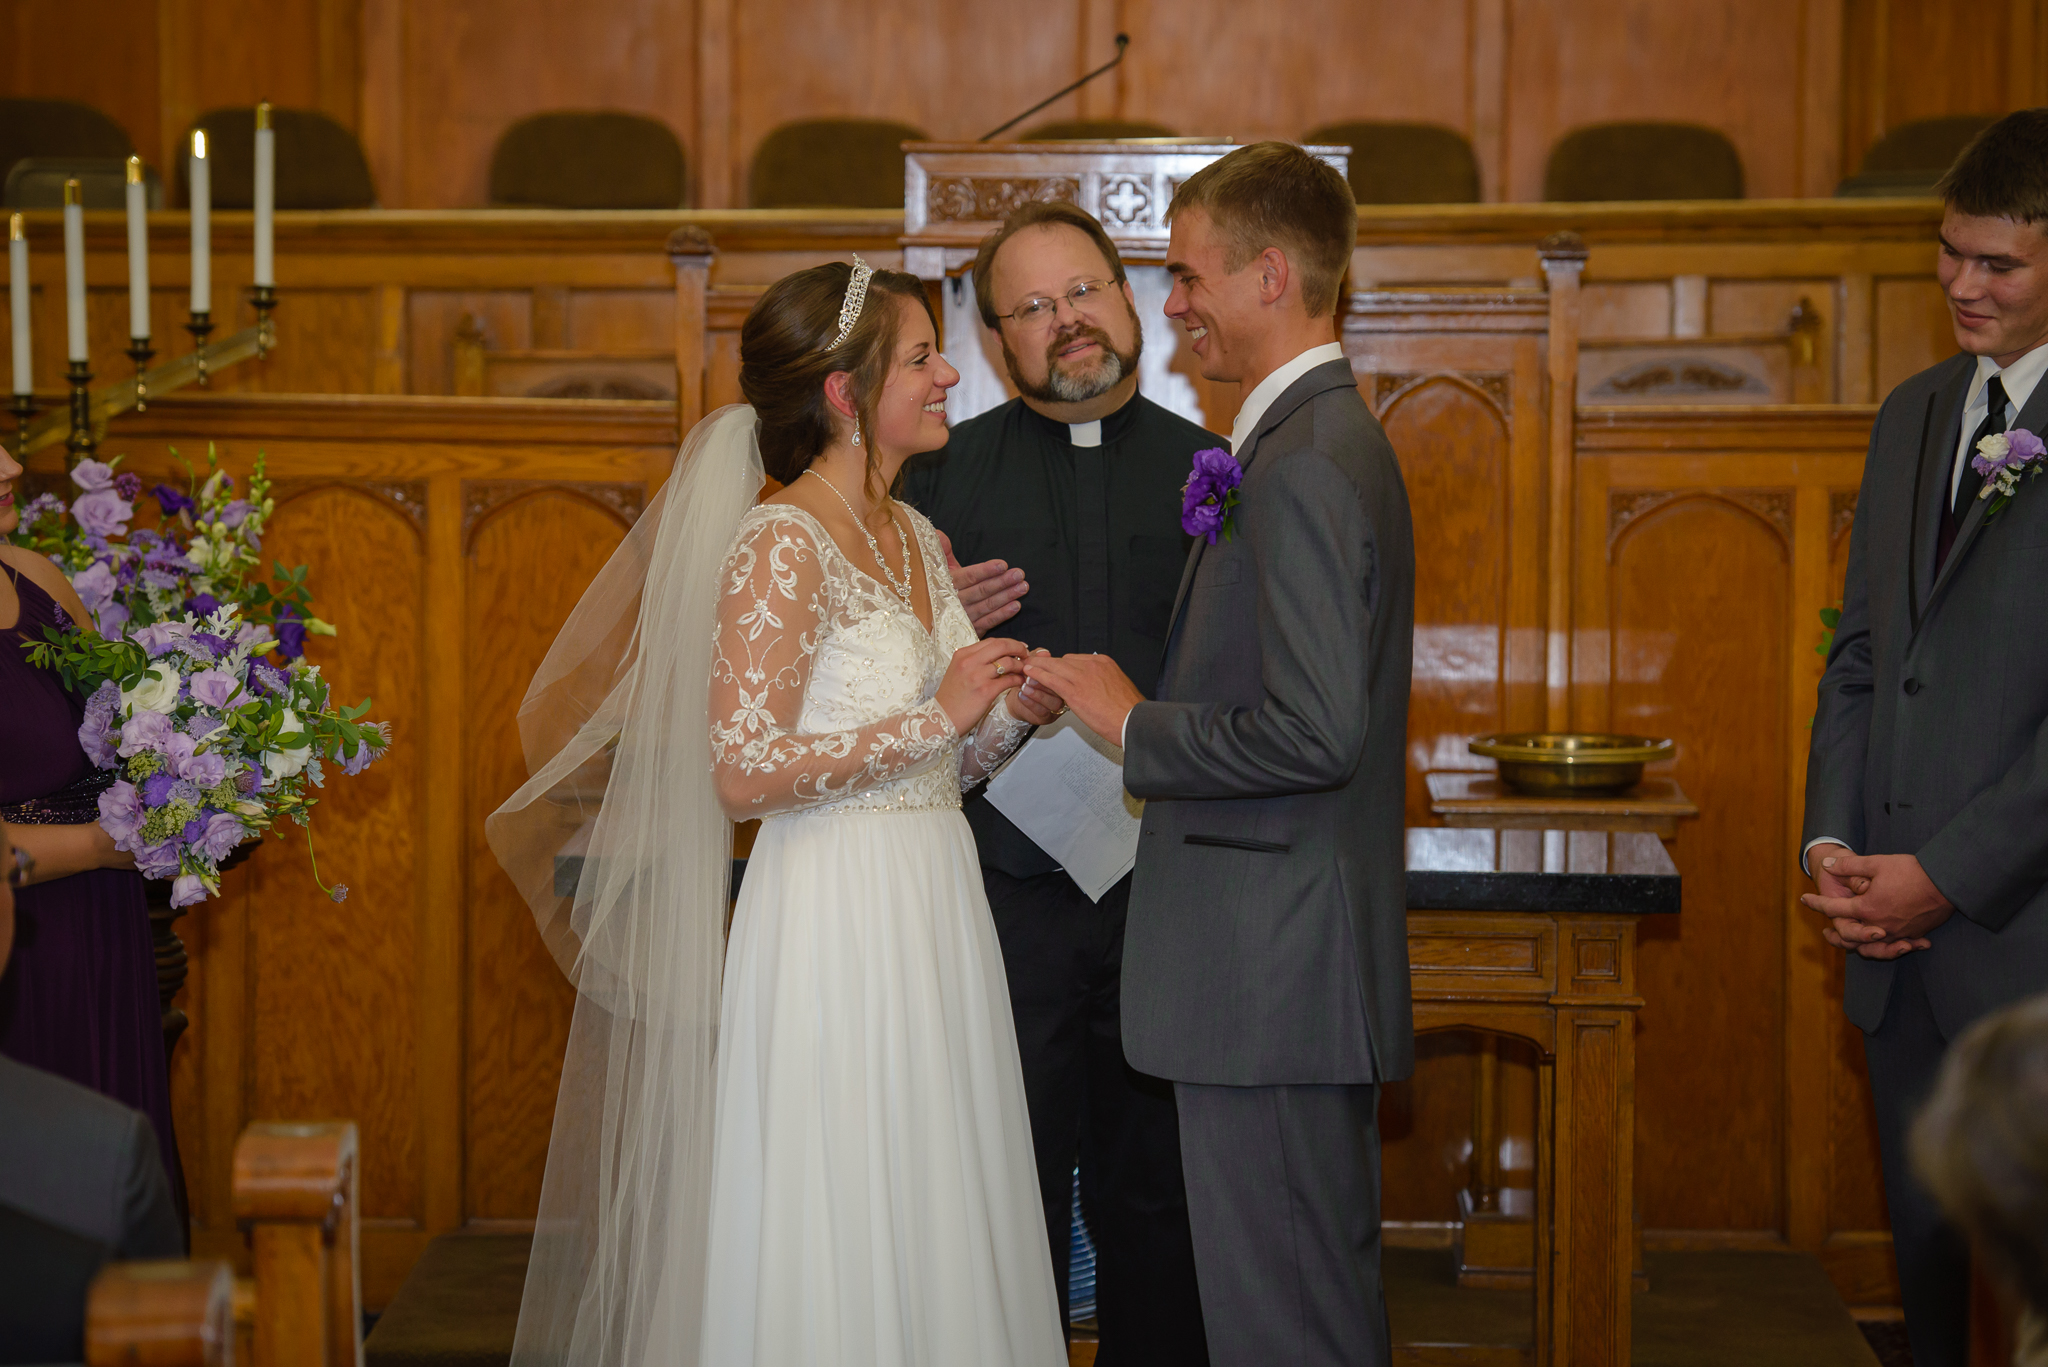 13-ashland washburn wedding photographyDSC_3714.jpg